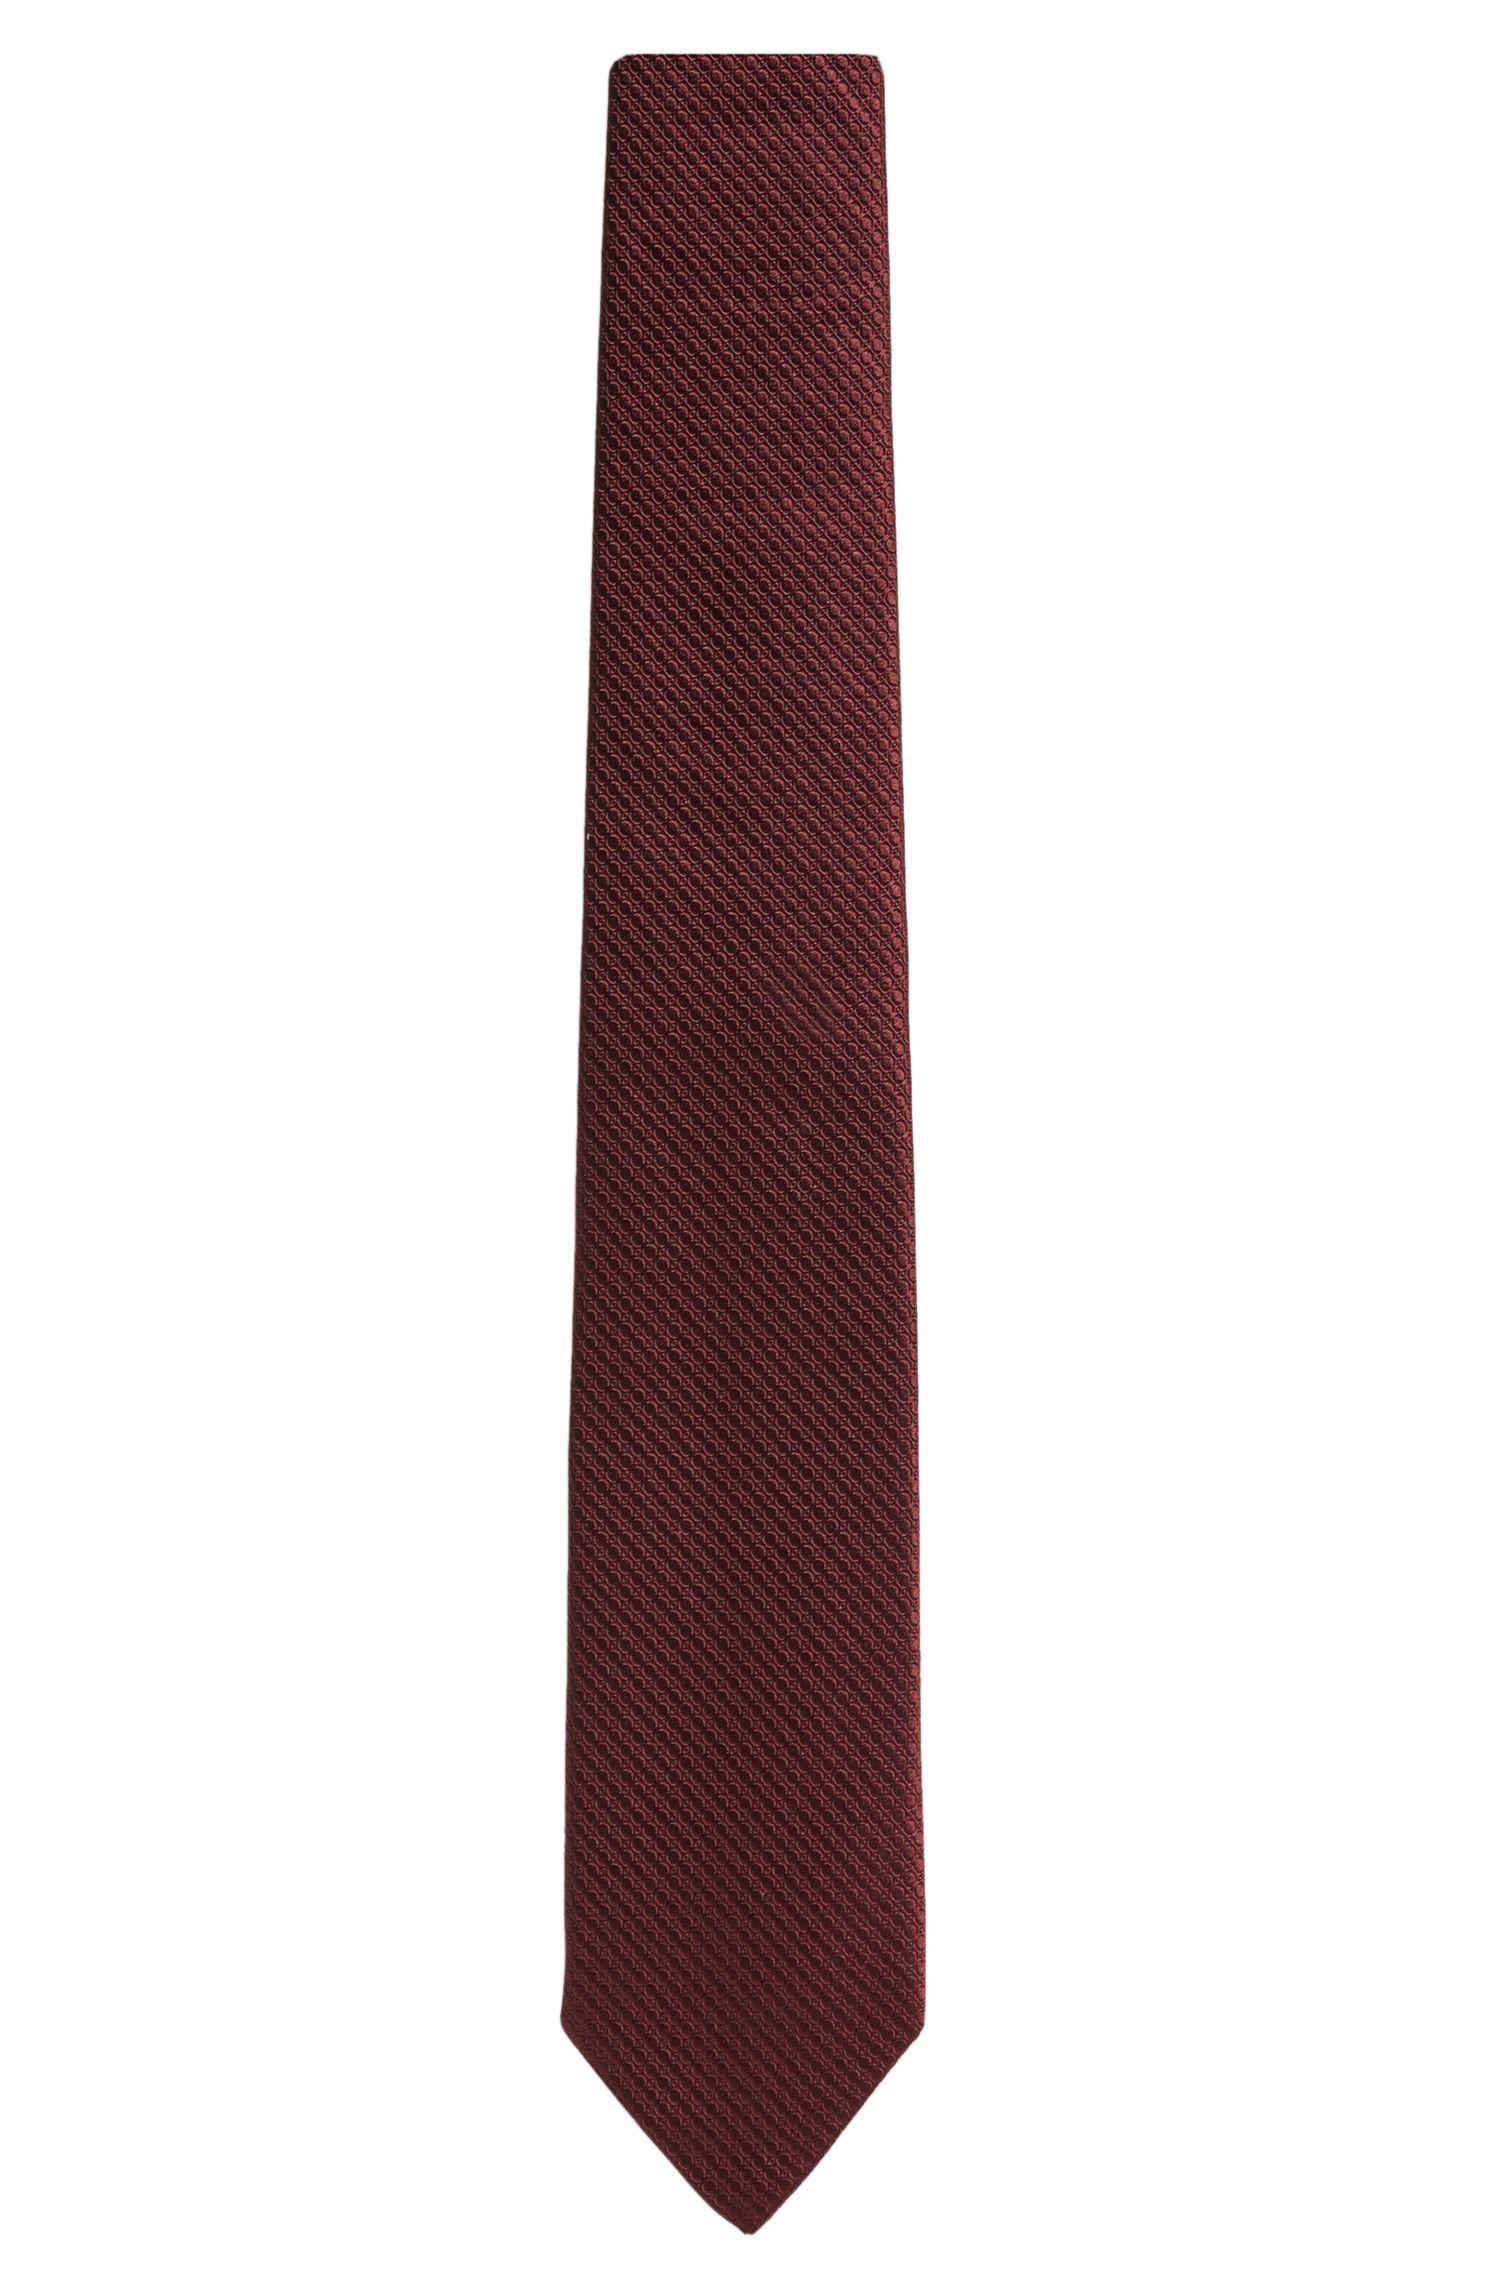 'Tie 7.5 cm'   Regular, Italian Silk Patterned Tie